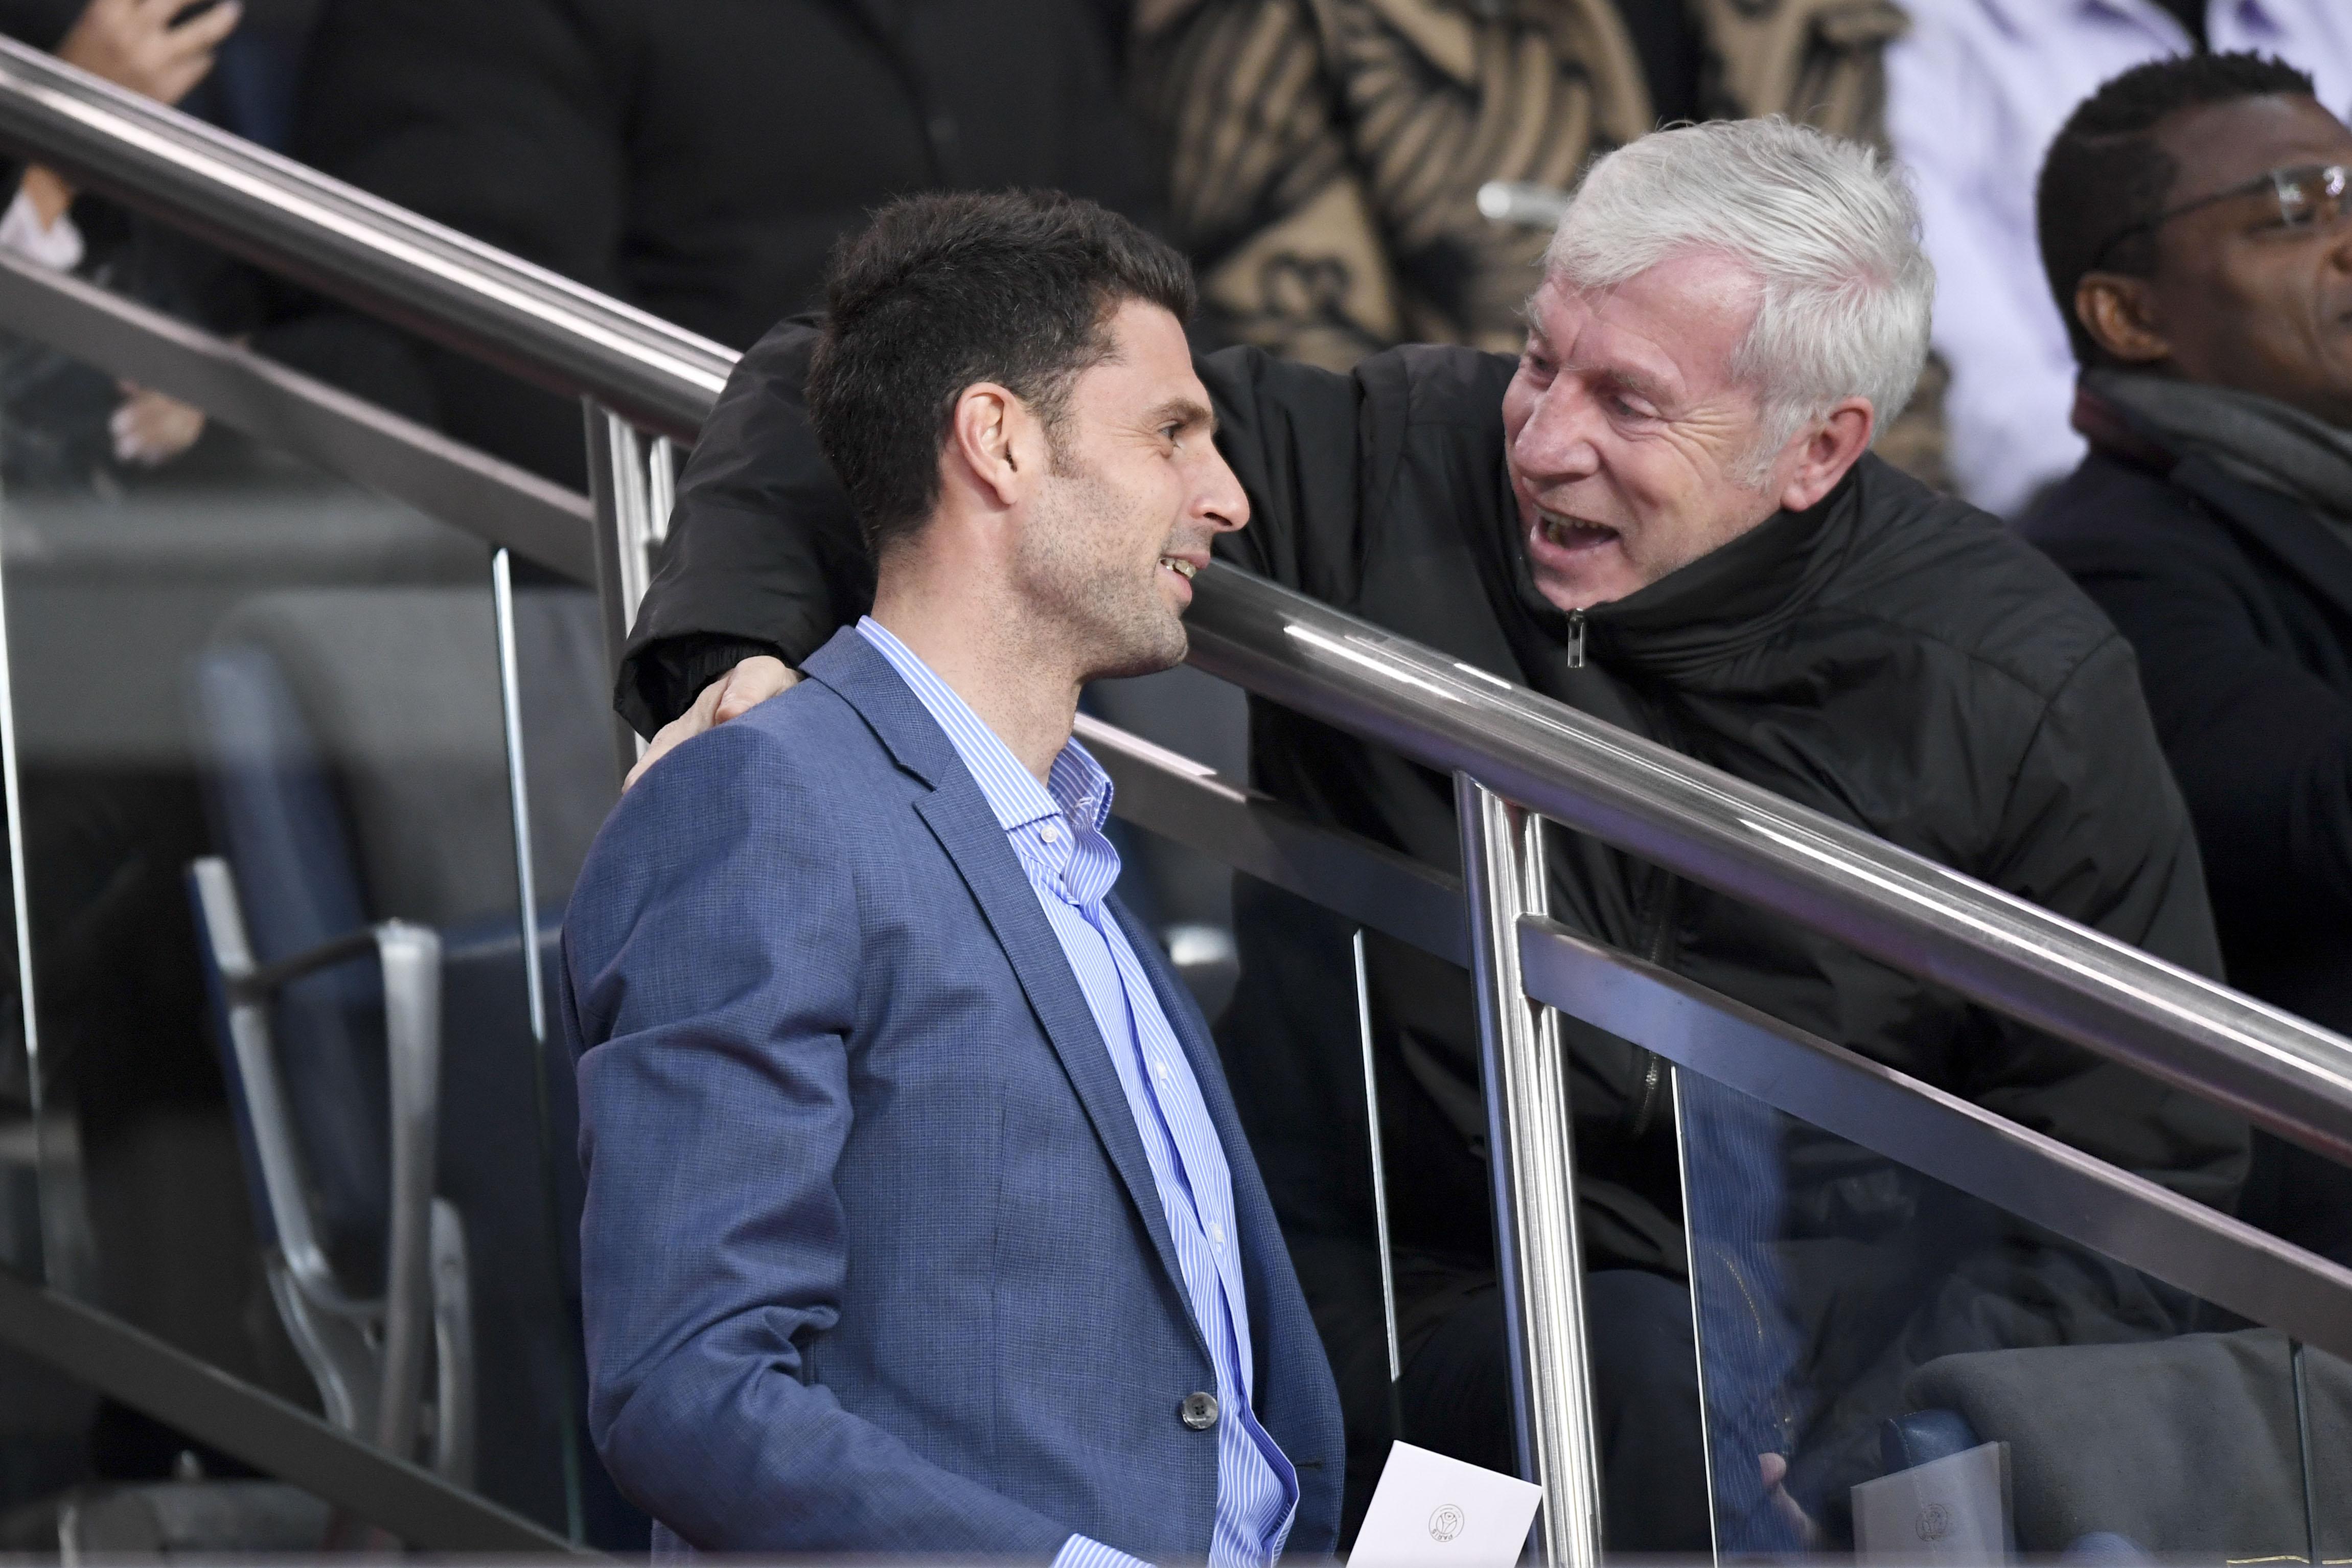 Football - Ligue 1 - Thiago Motta futur entraîneur du PSG après Tuchel ?